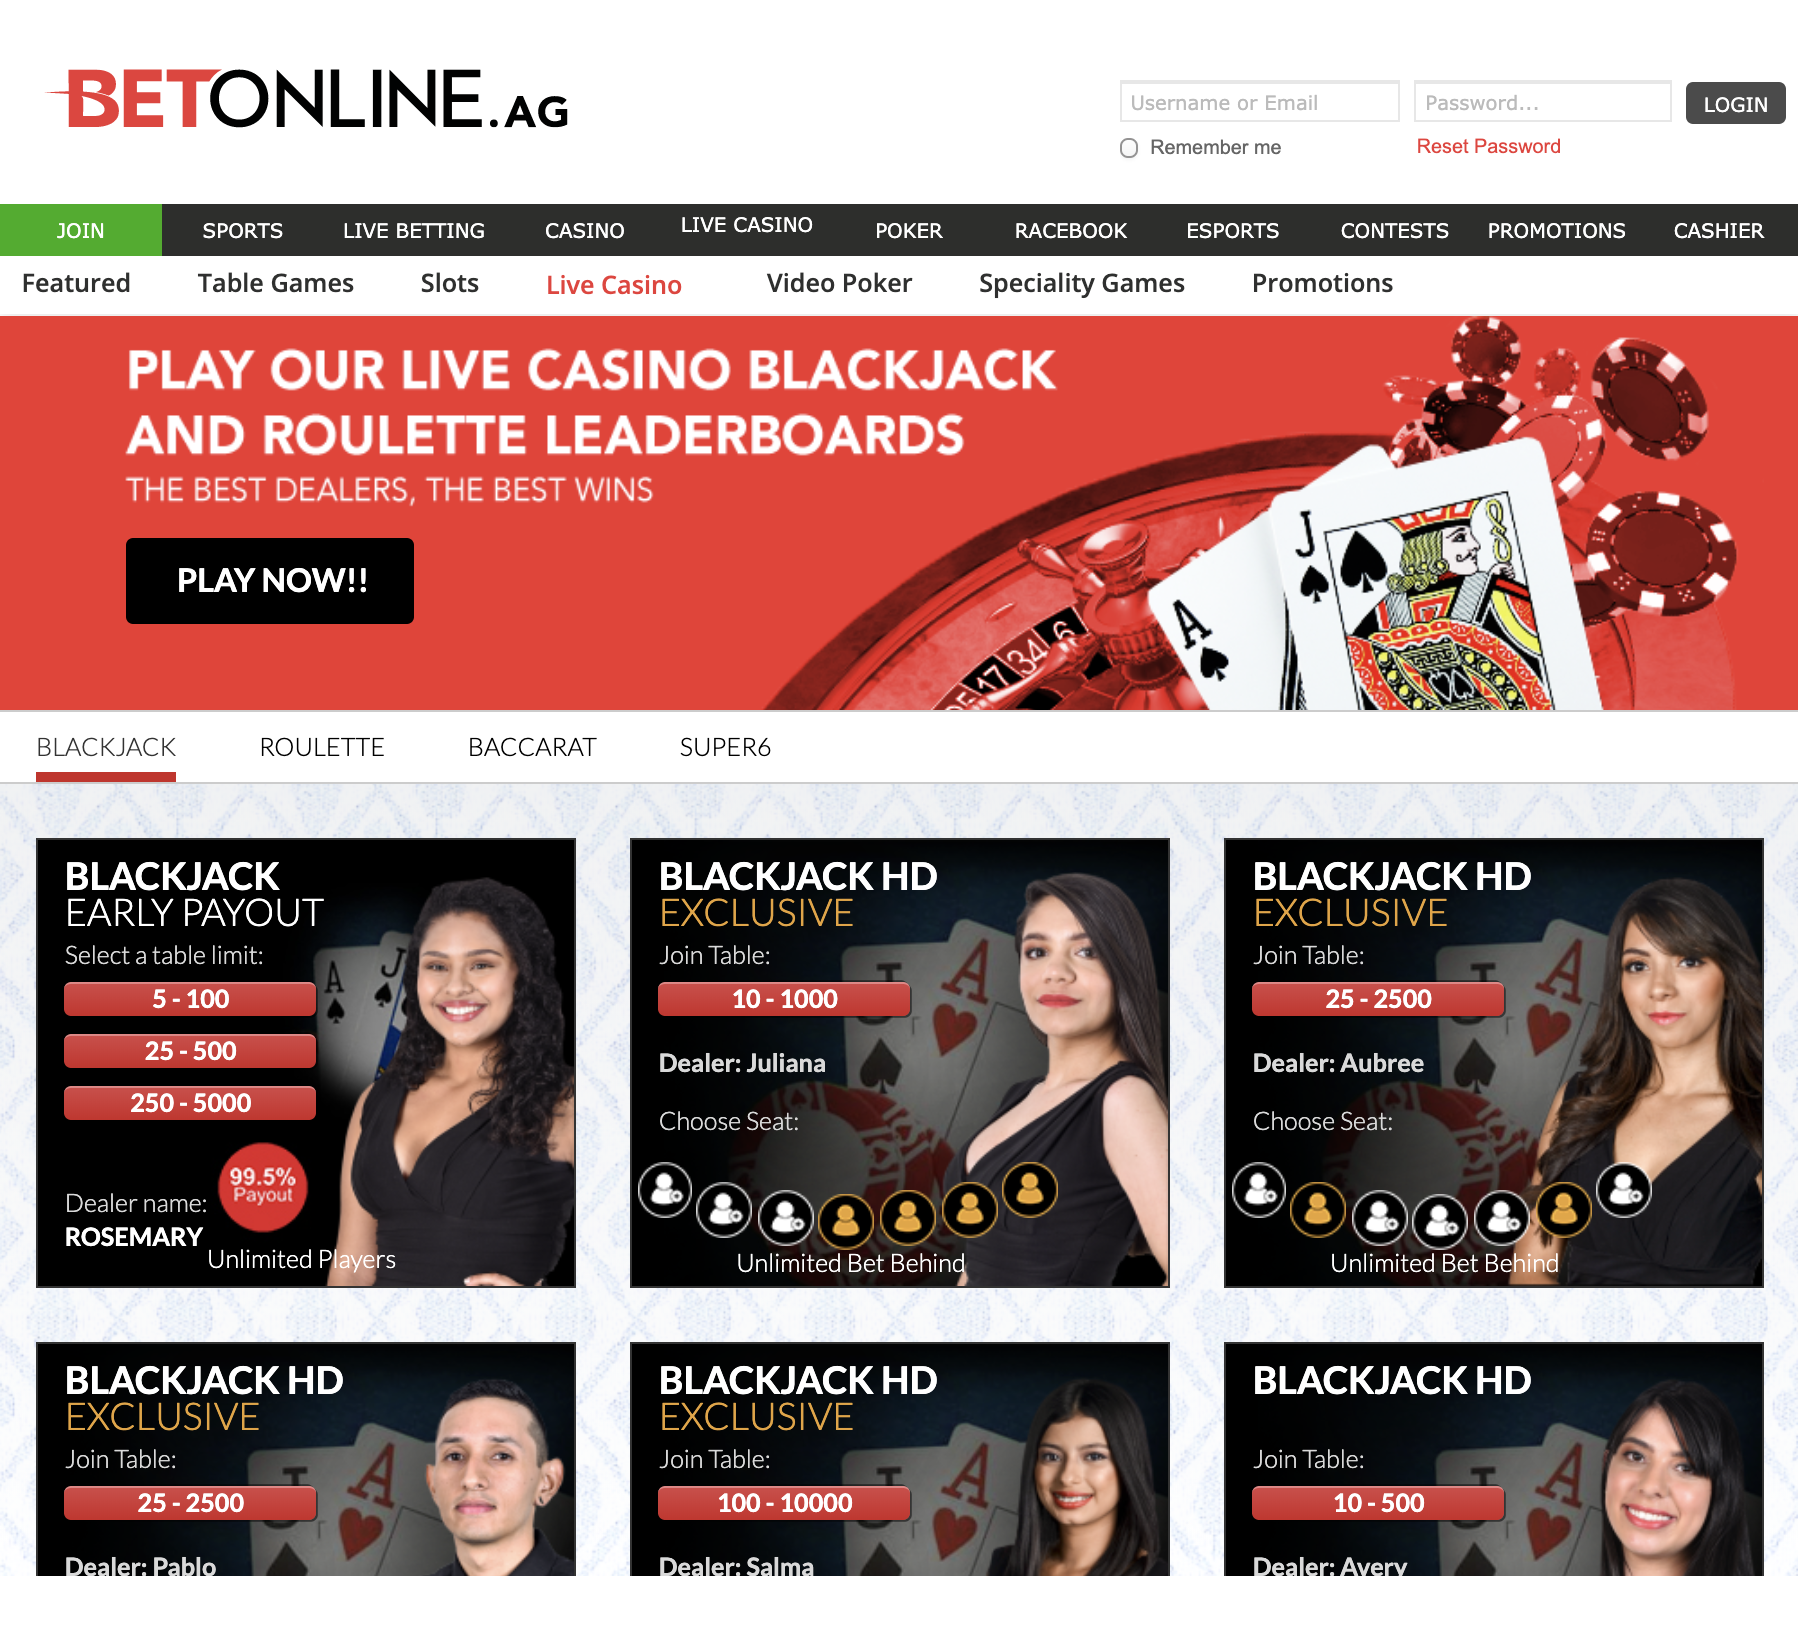 betonline live casino blackjack